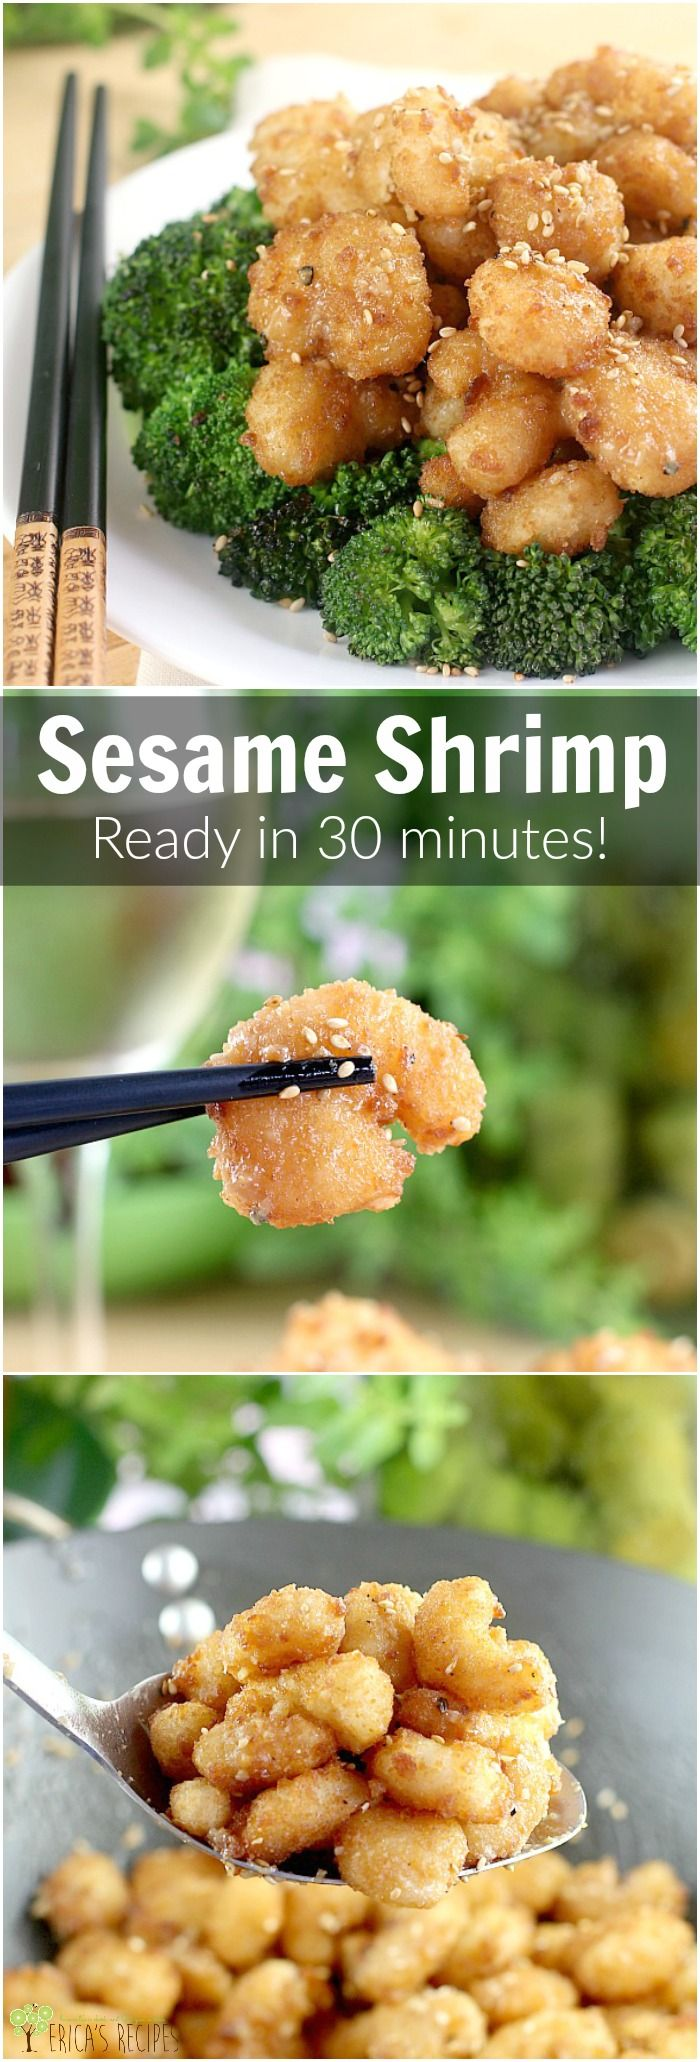 Msg 4 21+ Sesame Shrimp (30 Minute Meal!) http://wp.me/p4qC4h-3ED #40PerfectPairings #ad